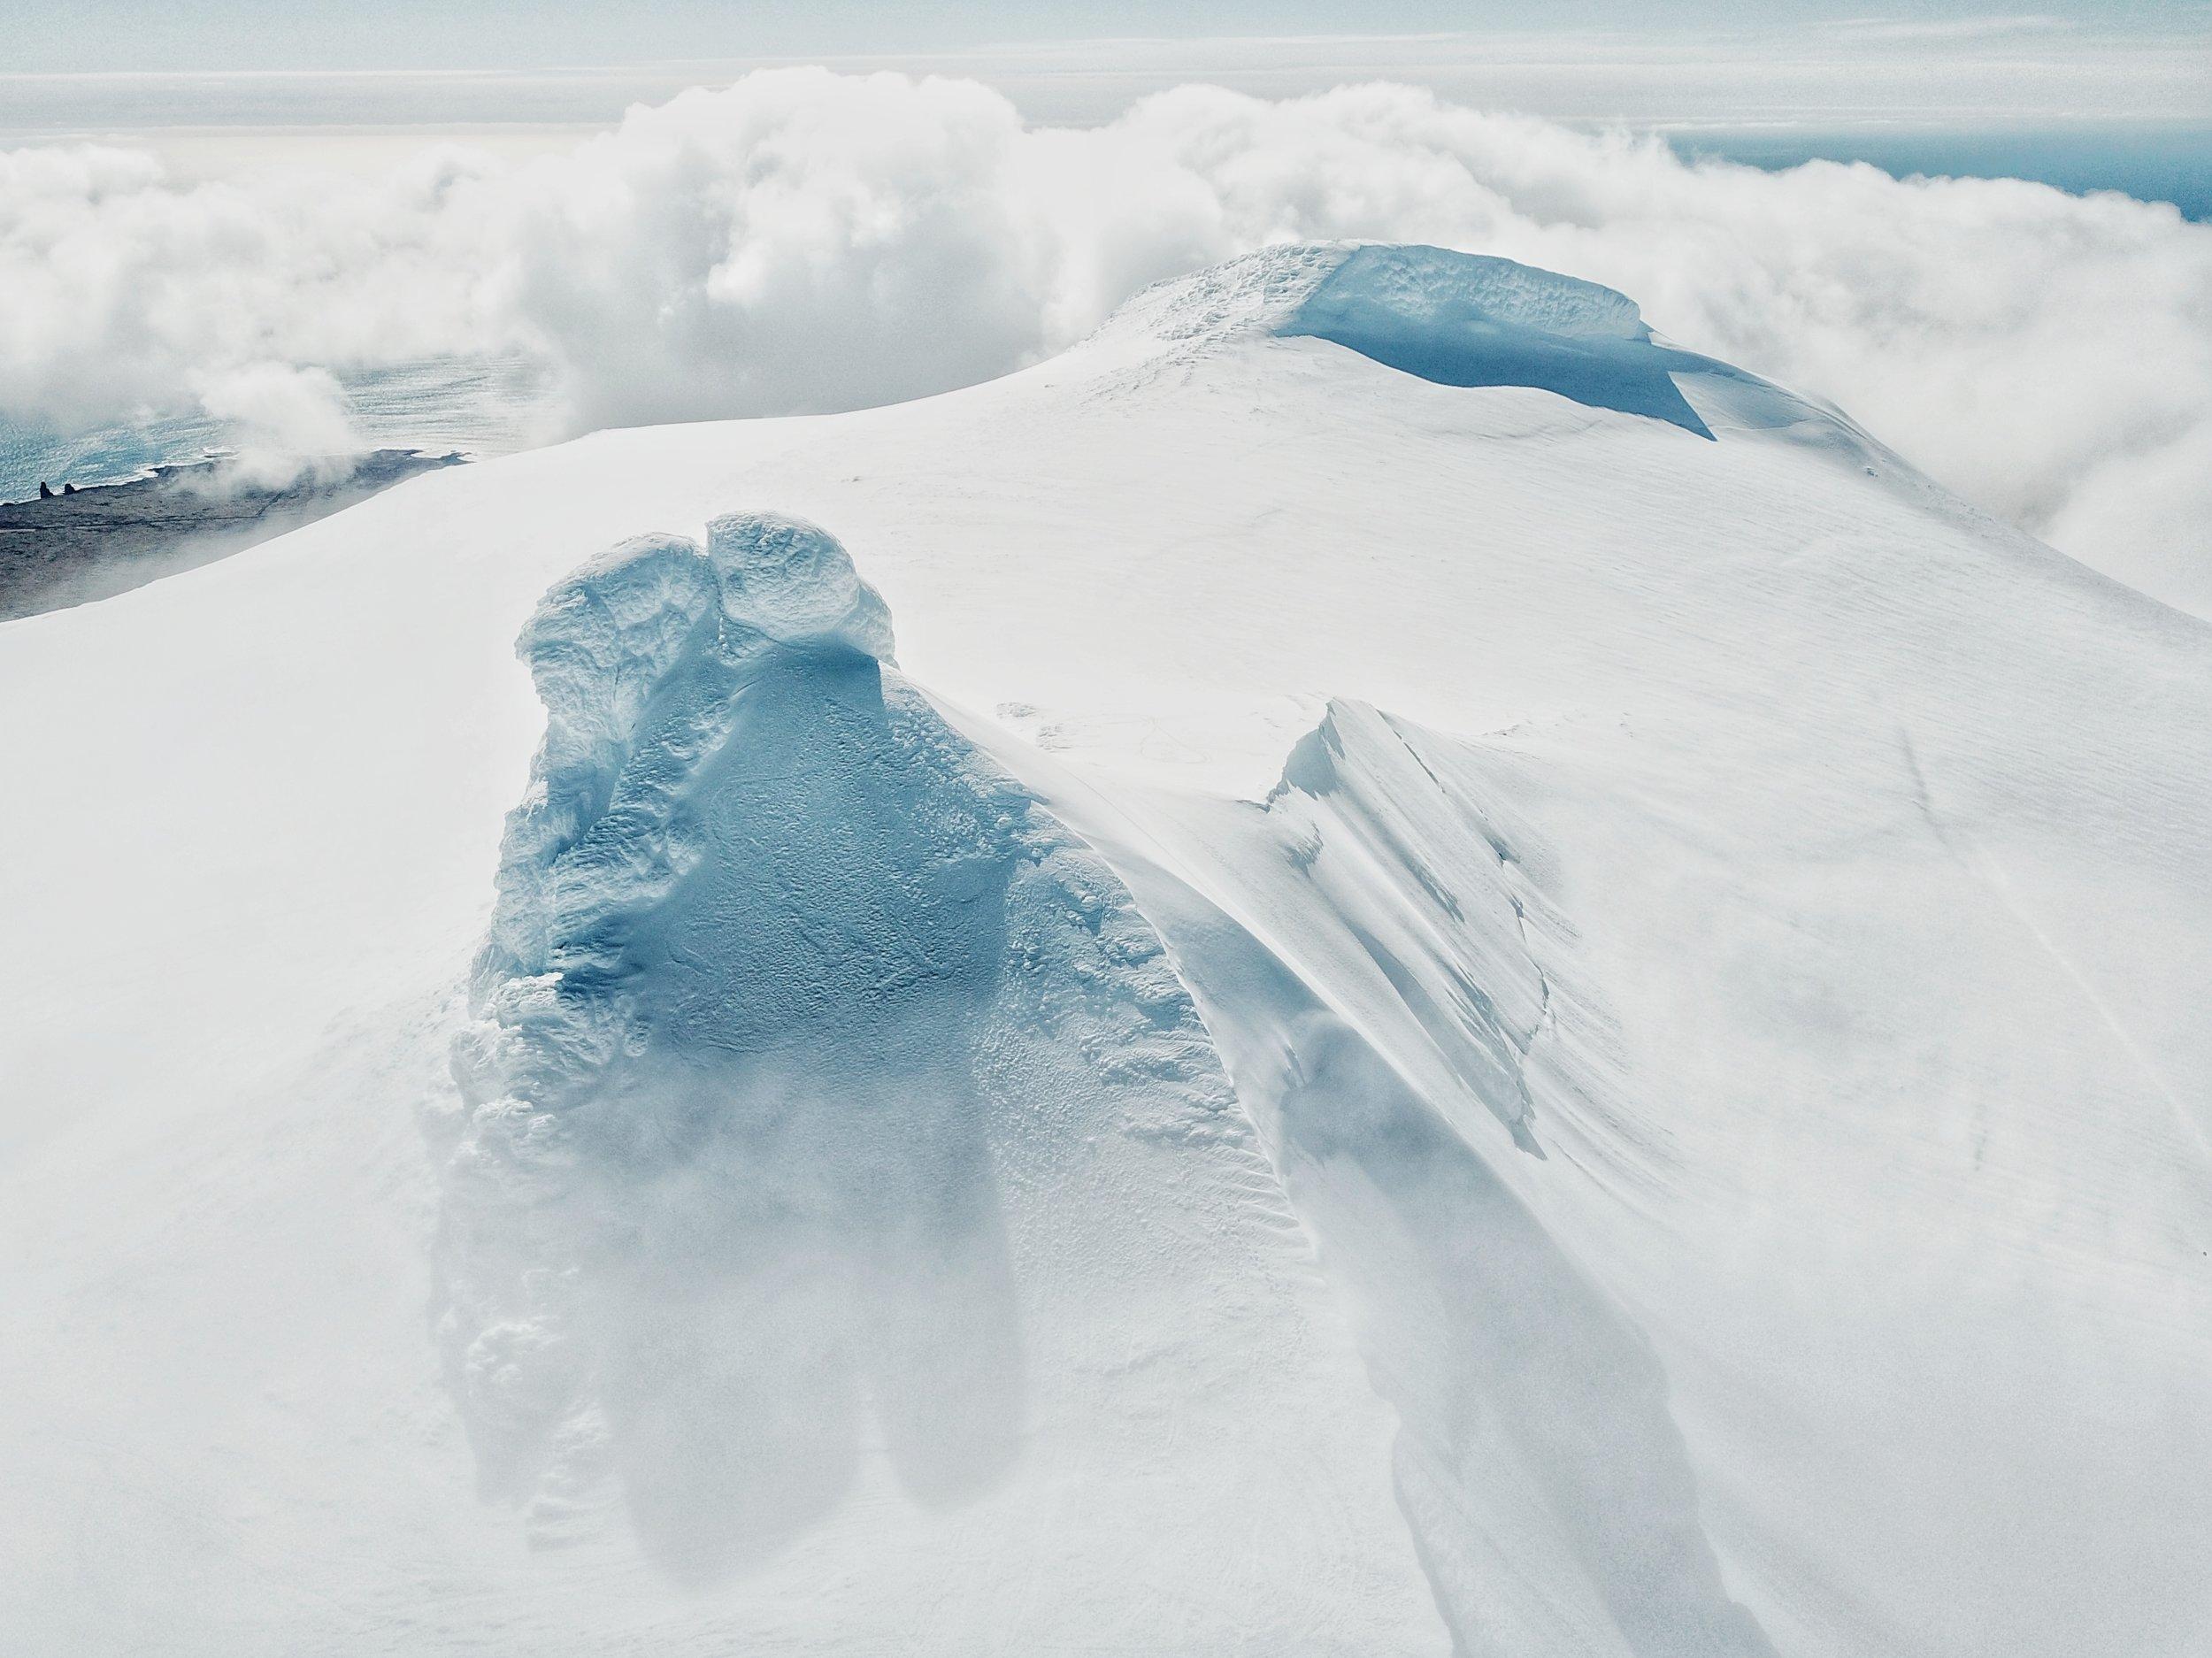 Snæfellsjökull Glacier Summit from above